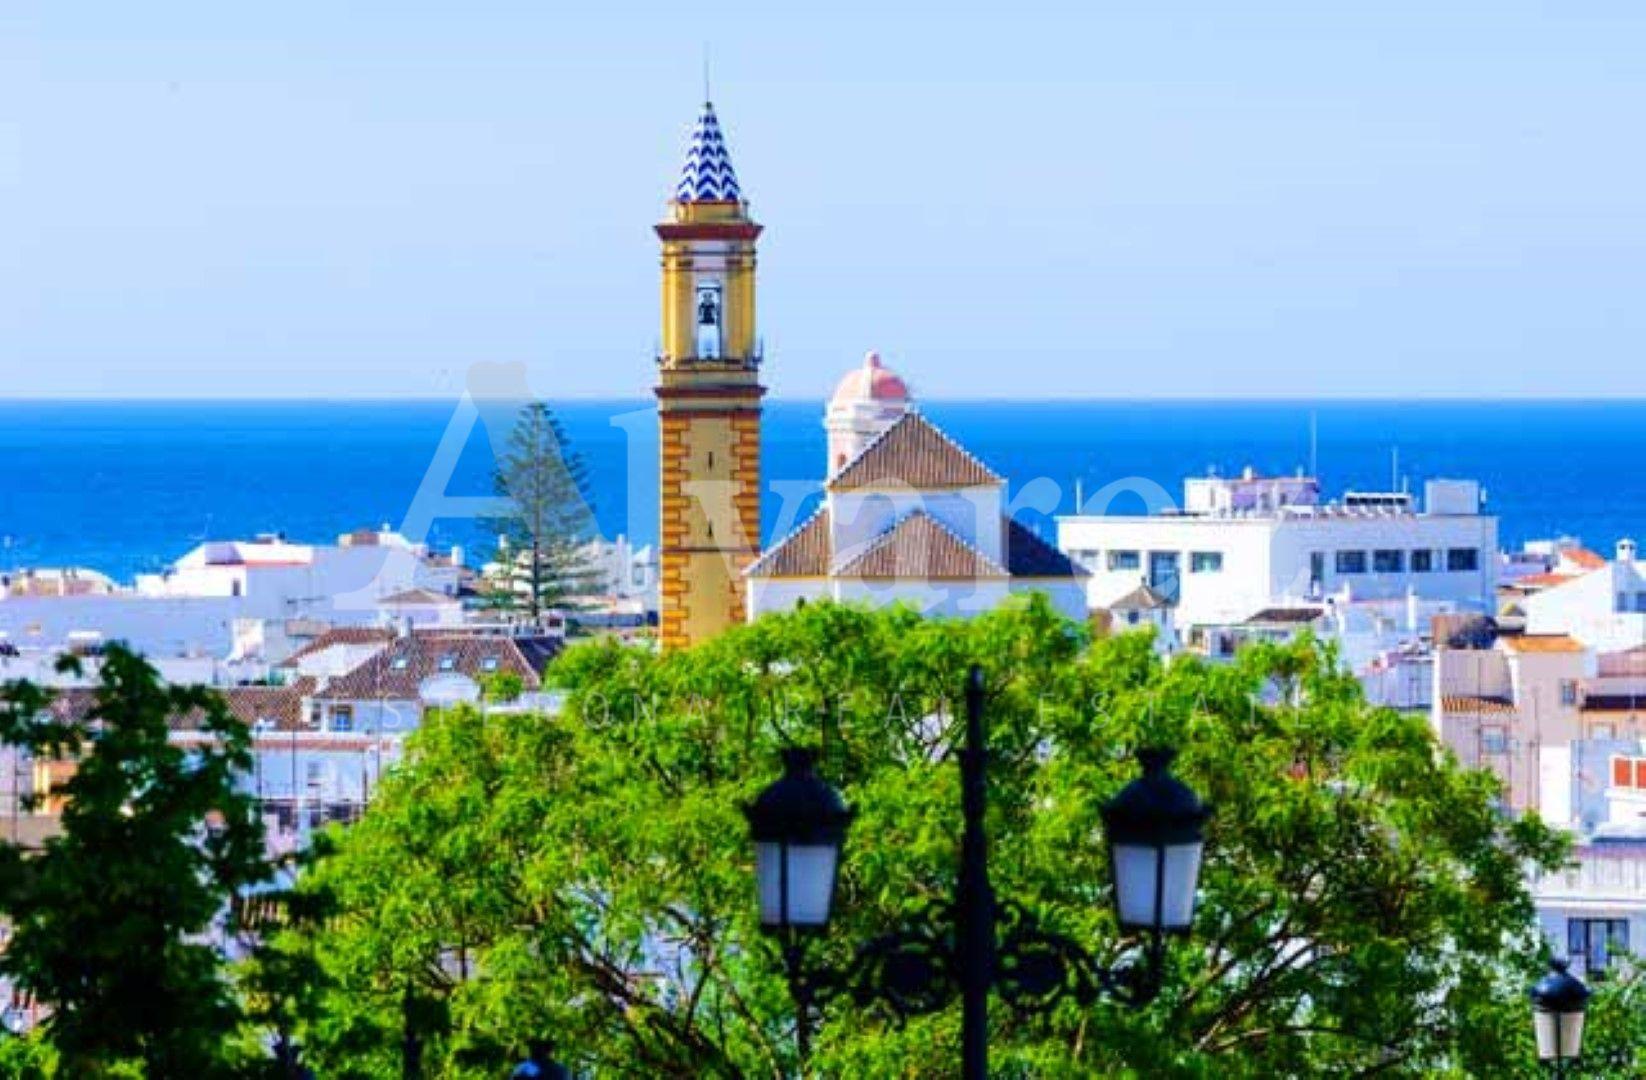 Commercial Premises in Estepona Old Town, Estepona